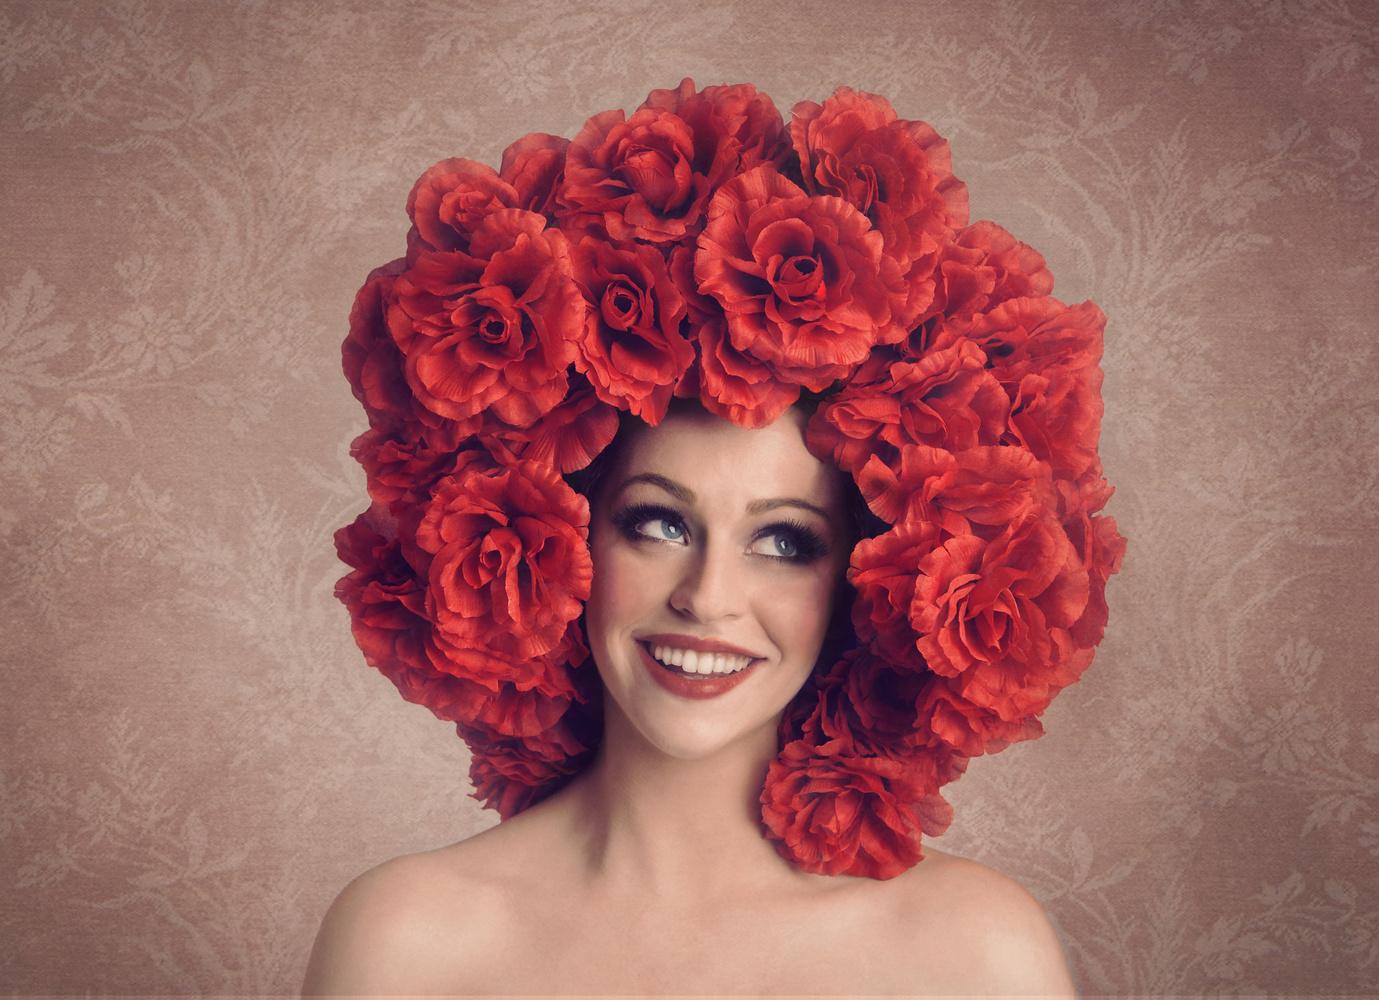 Bloom by Jessica Truscott